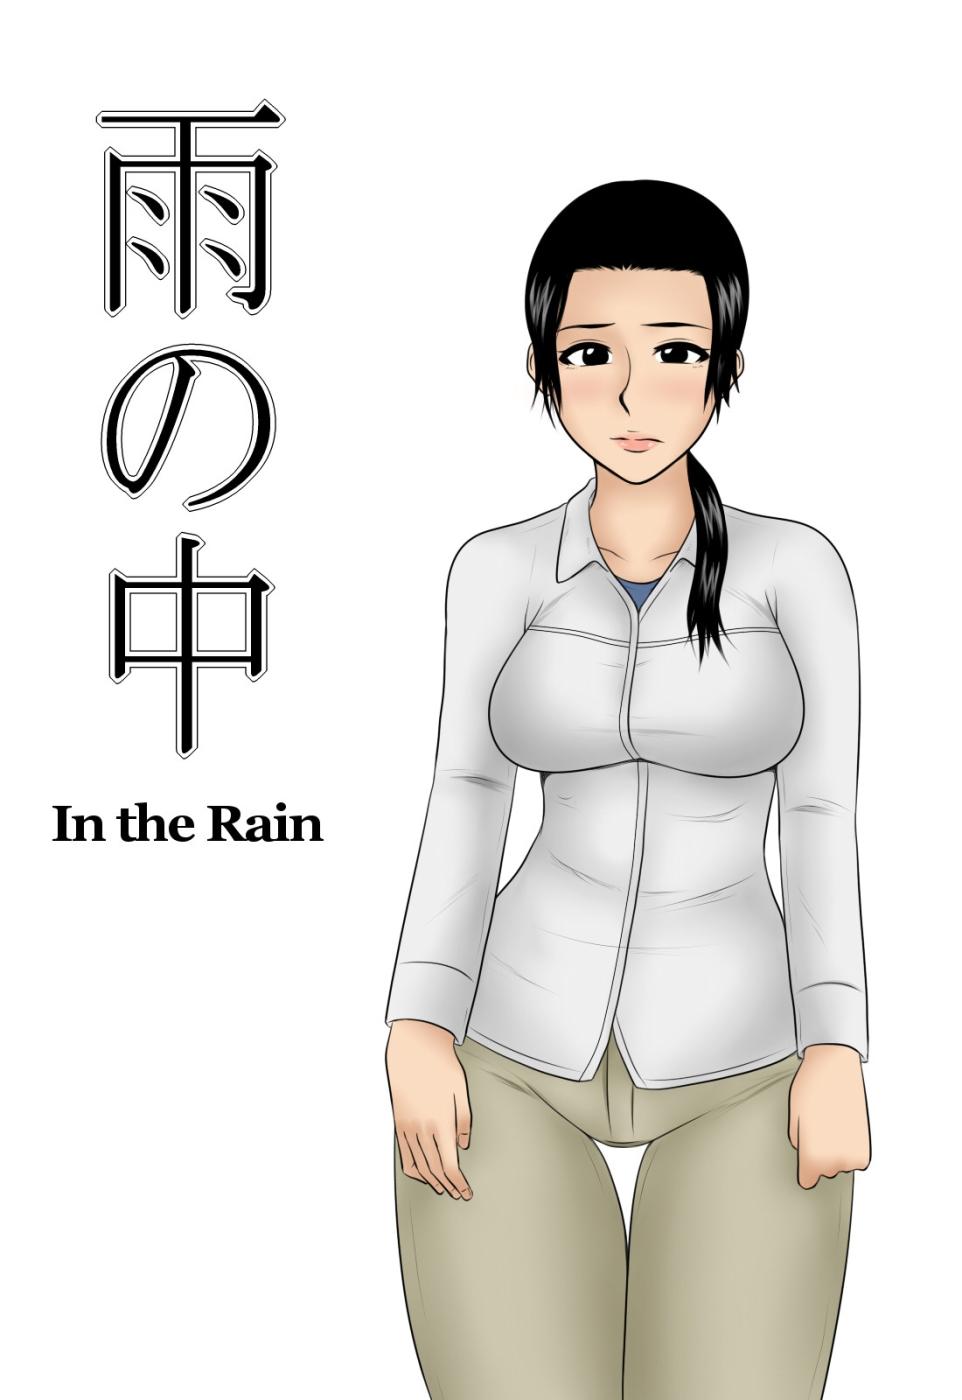 In the Rain- Hentai porn comics 8 muses